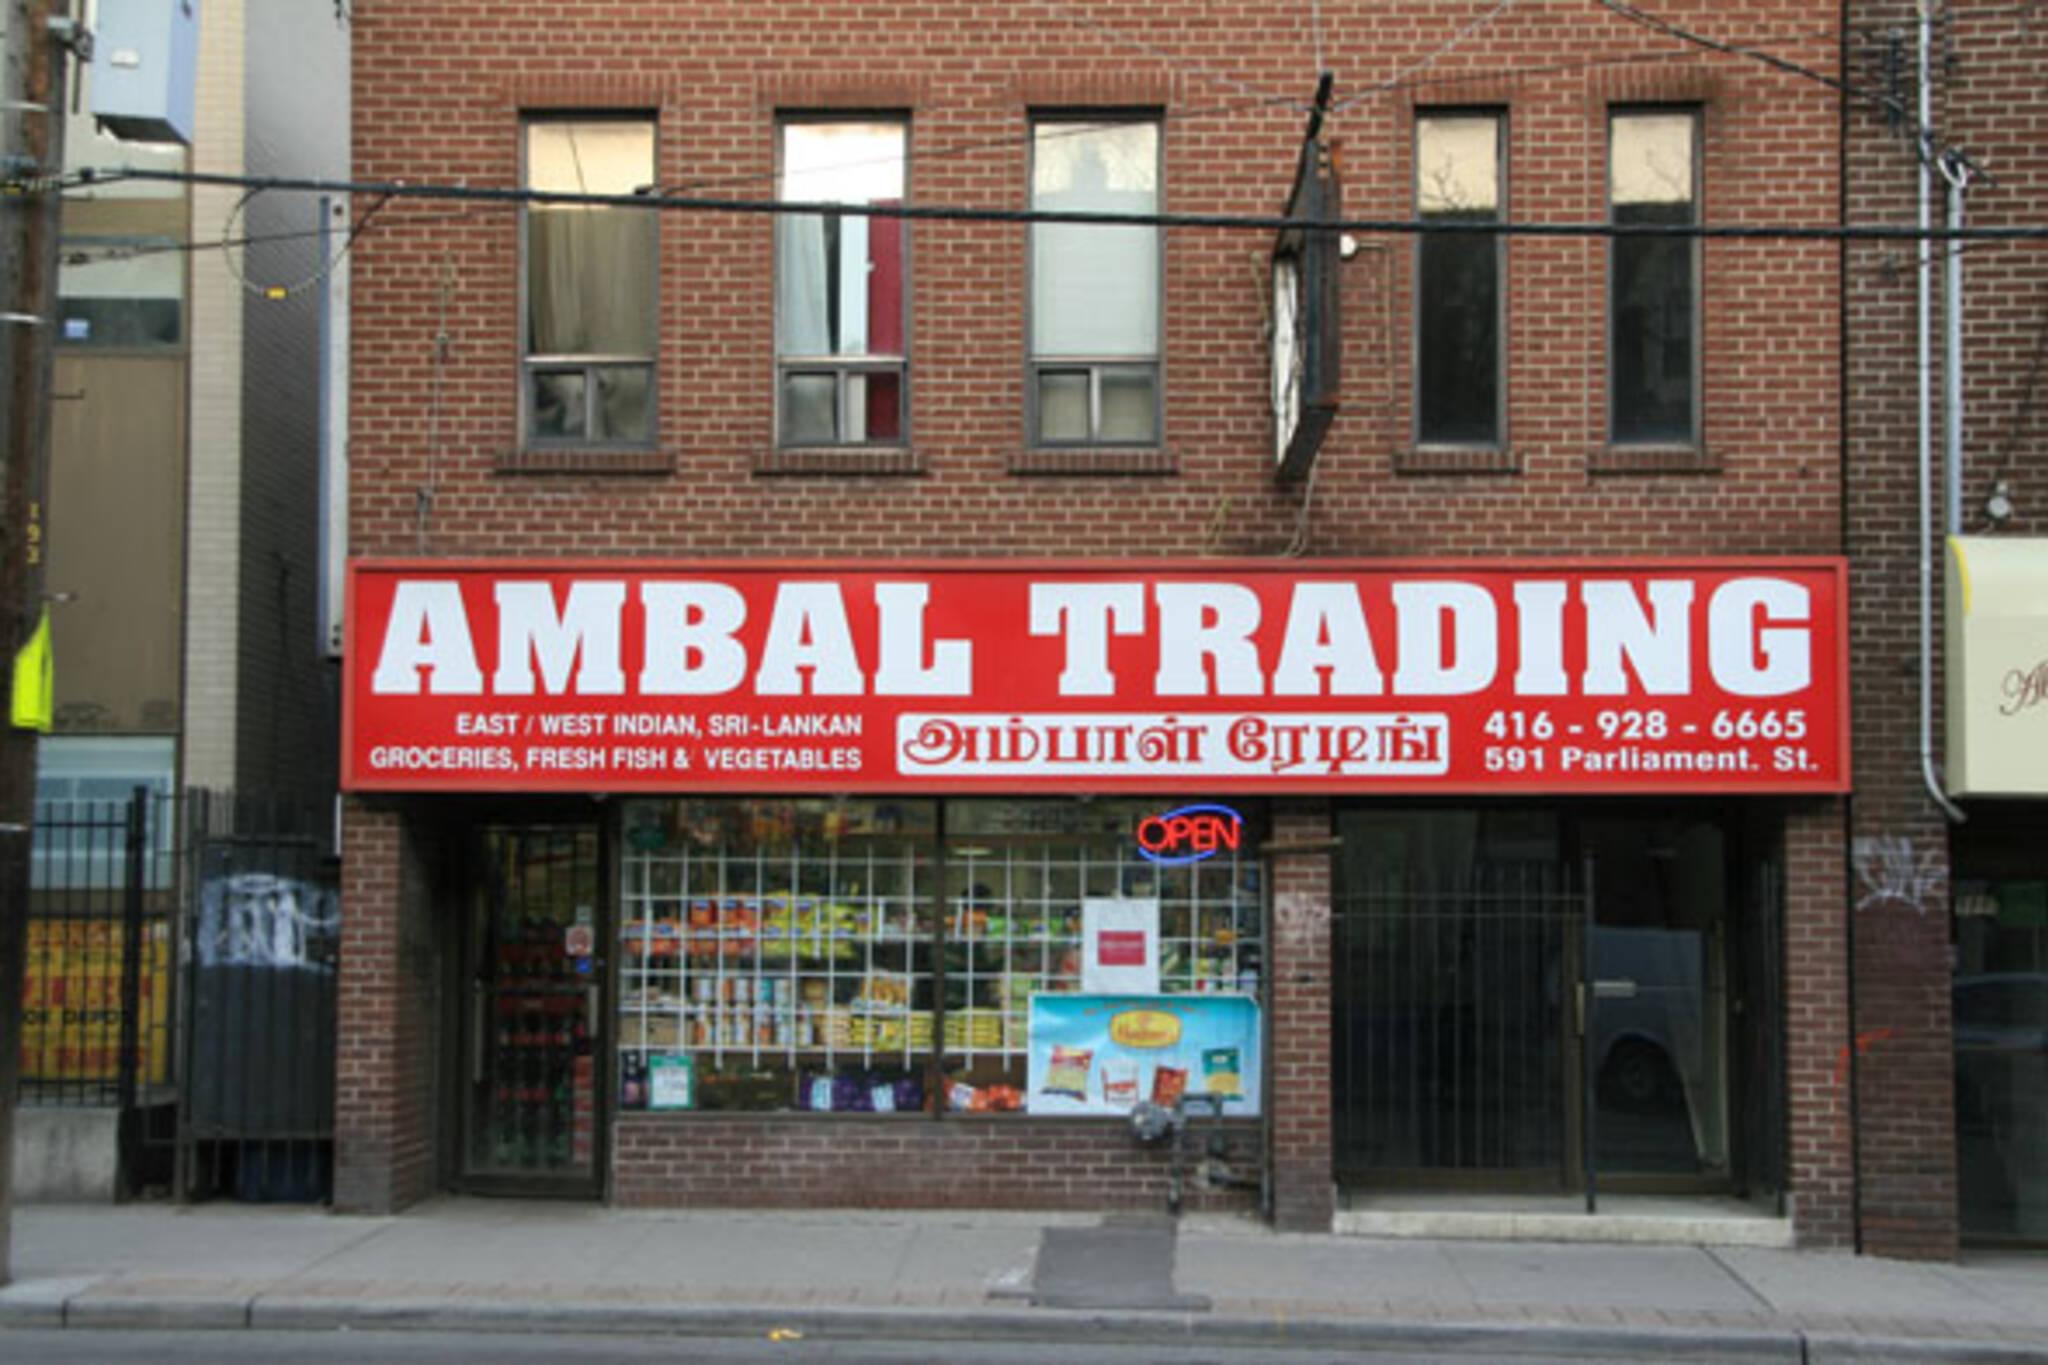 Ambal Trading